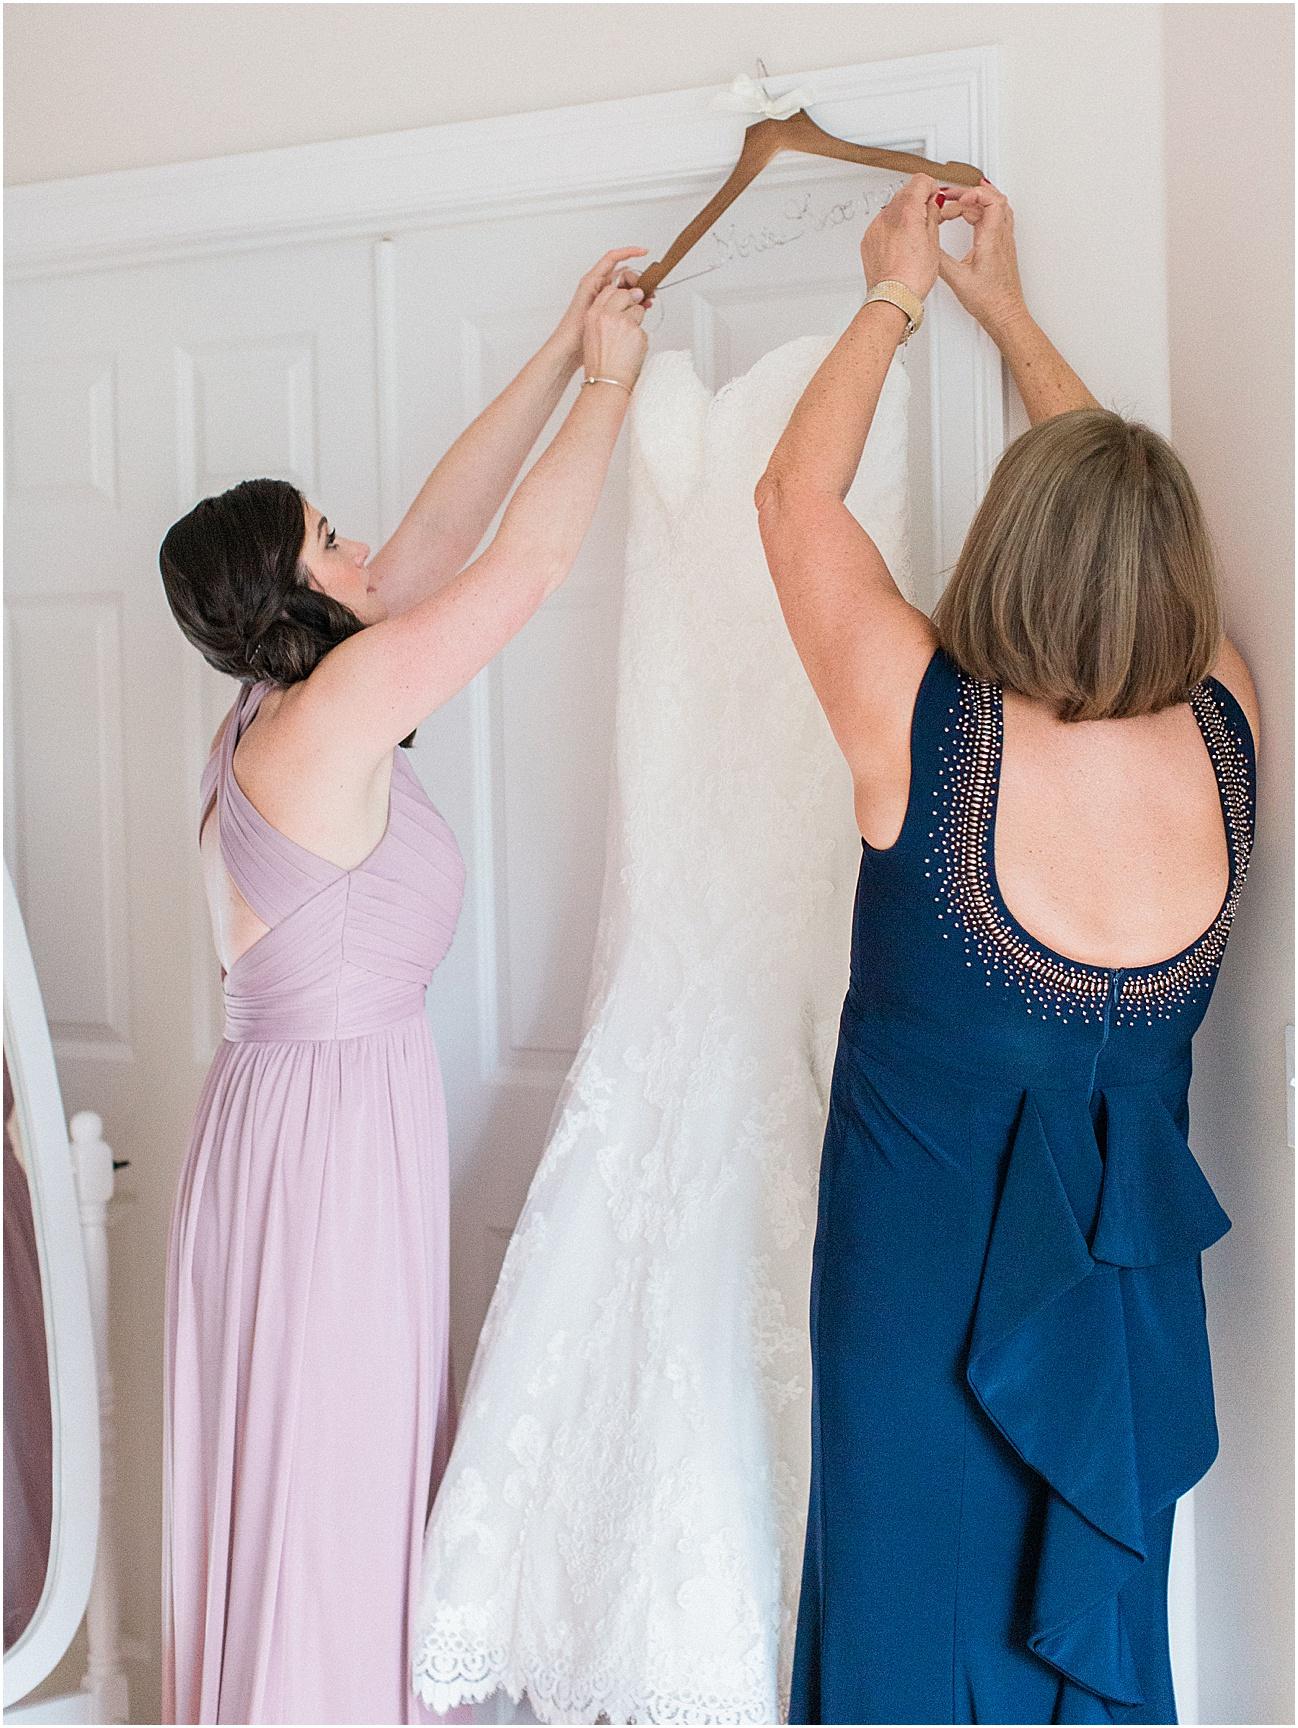 danielle_sean_willowbend_rain_rainy_day_cape_cod_boston_wedding_photographer_meredith_jane_photography_photo_1661.jpg